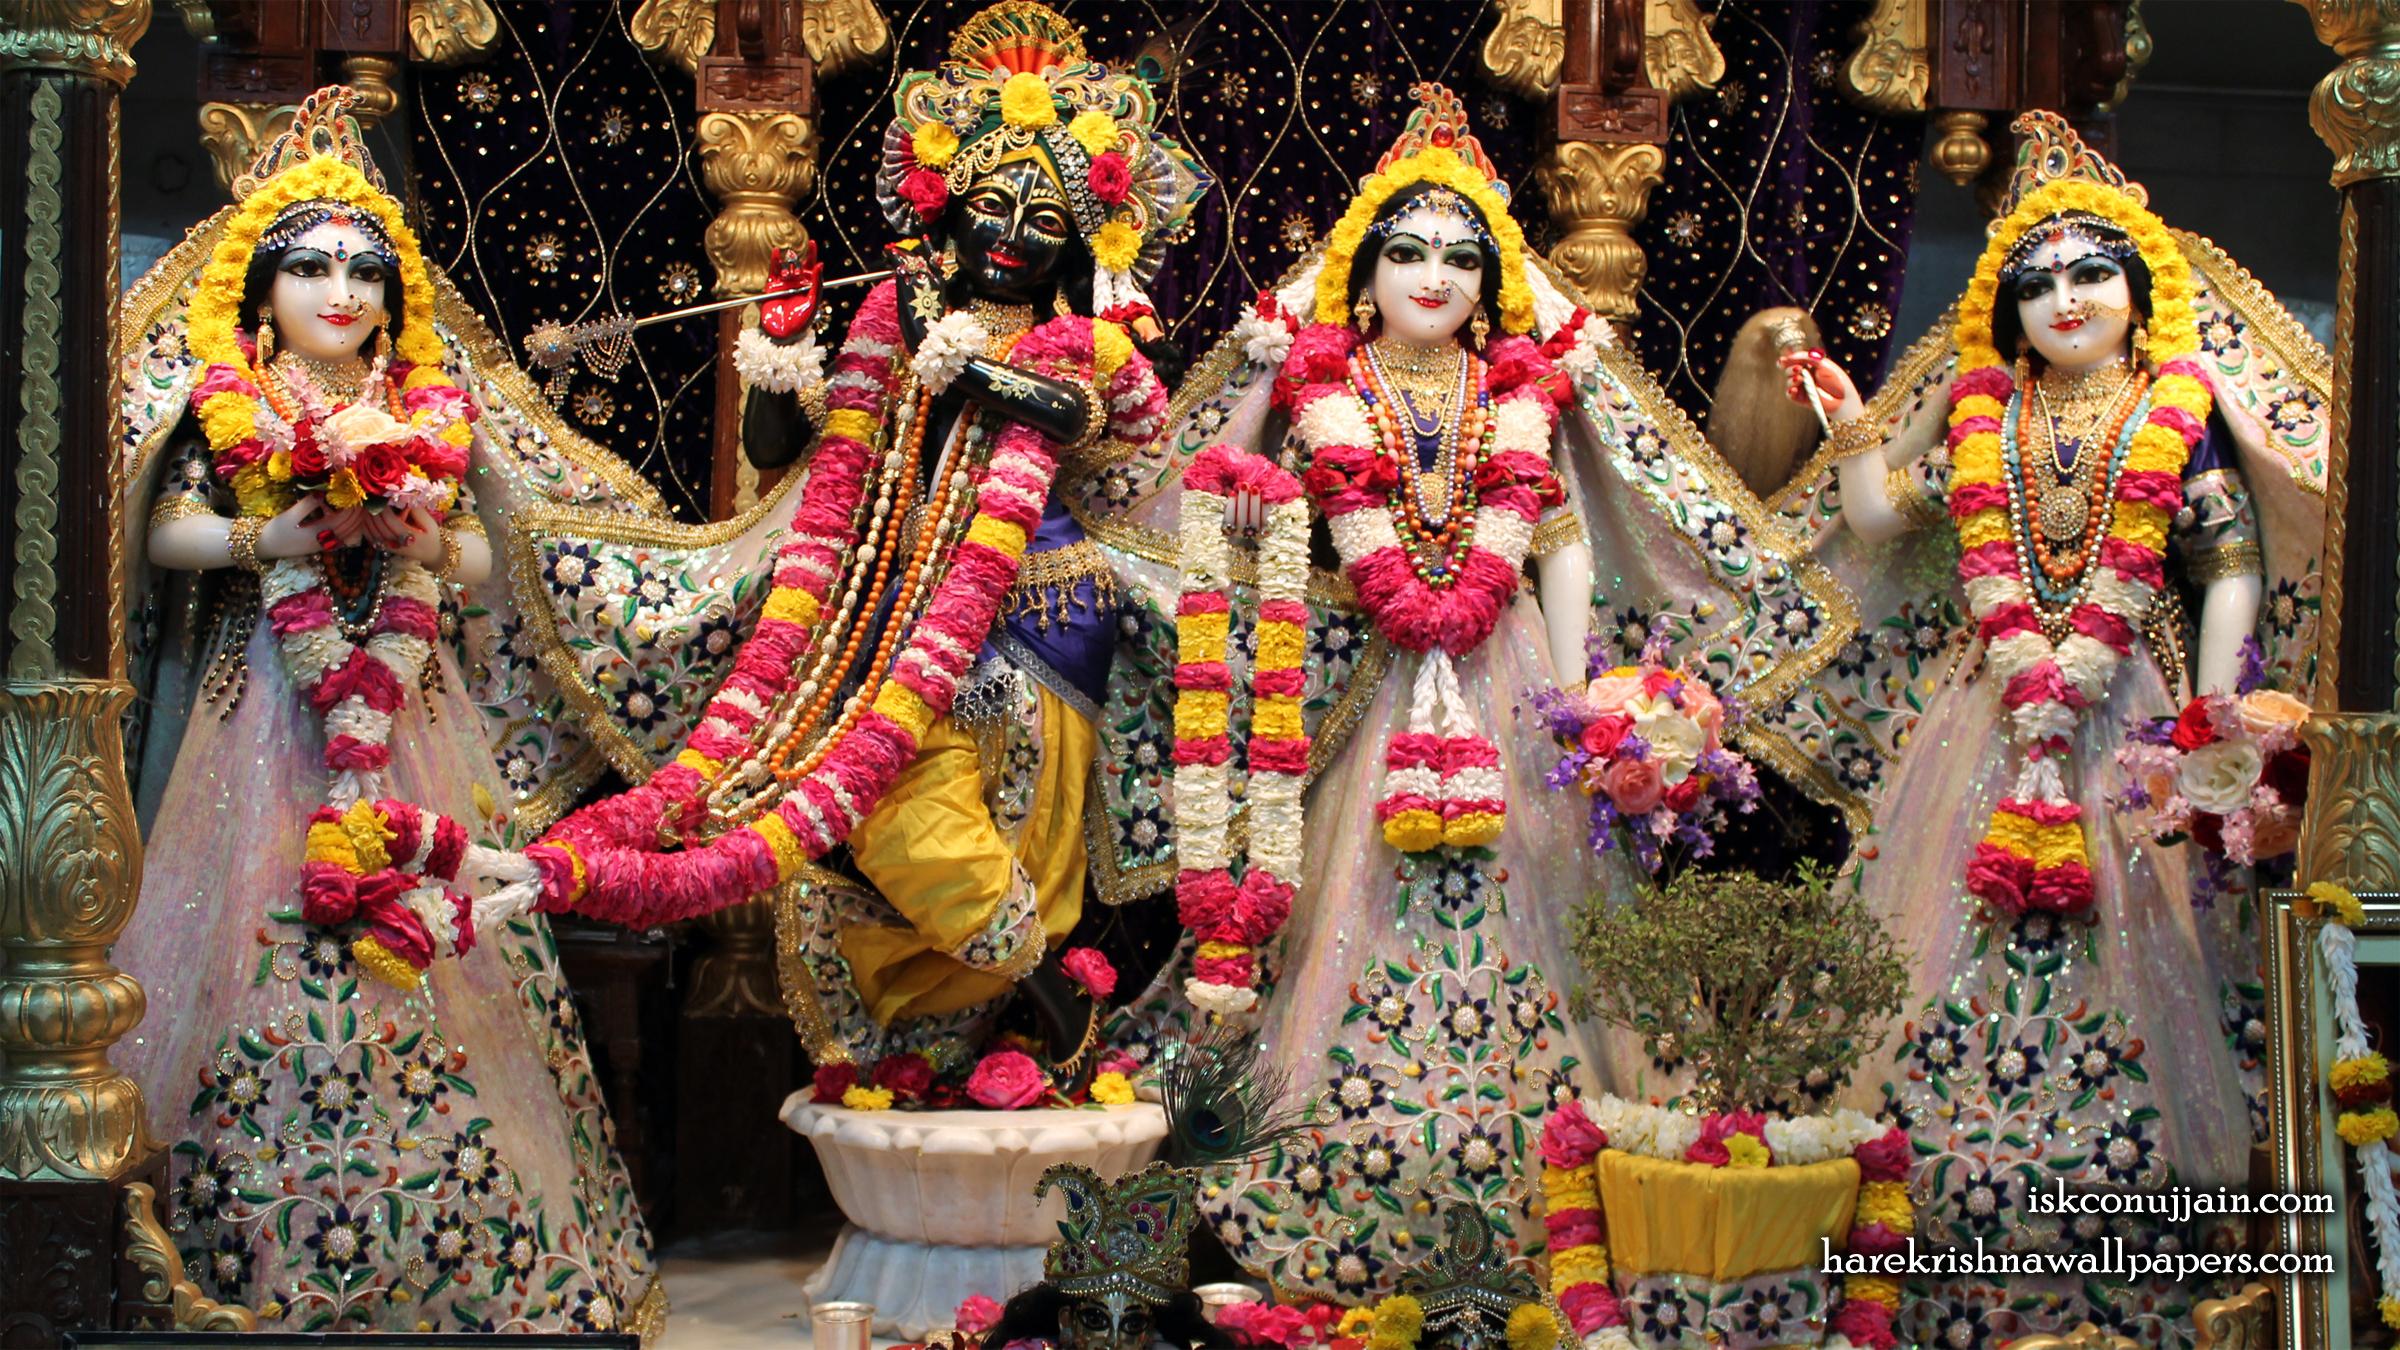 Sri Sri Radha Madanmohan Lalita Vishakha Wallpaper (001) Size 2400x1350 Download